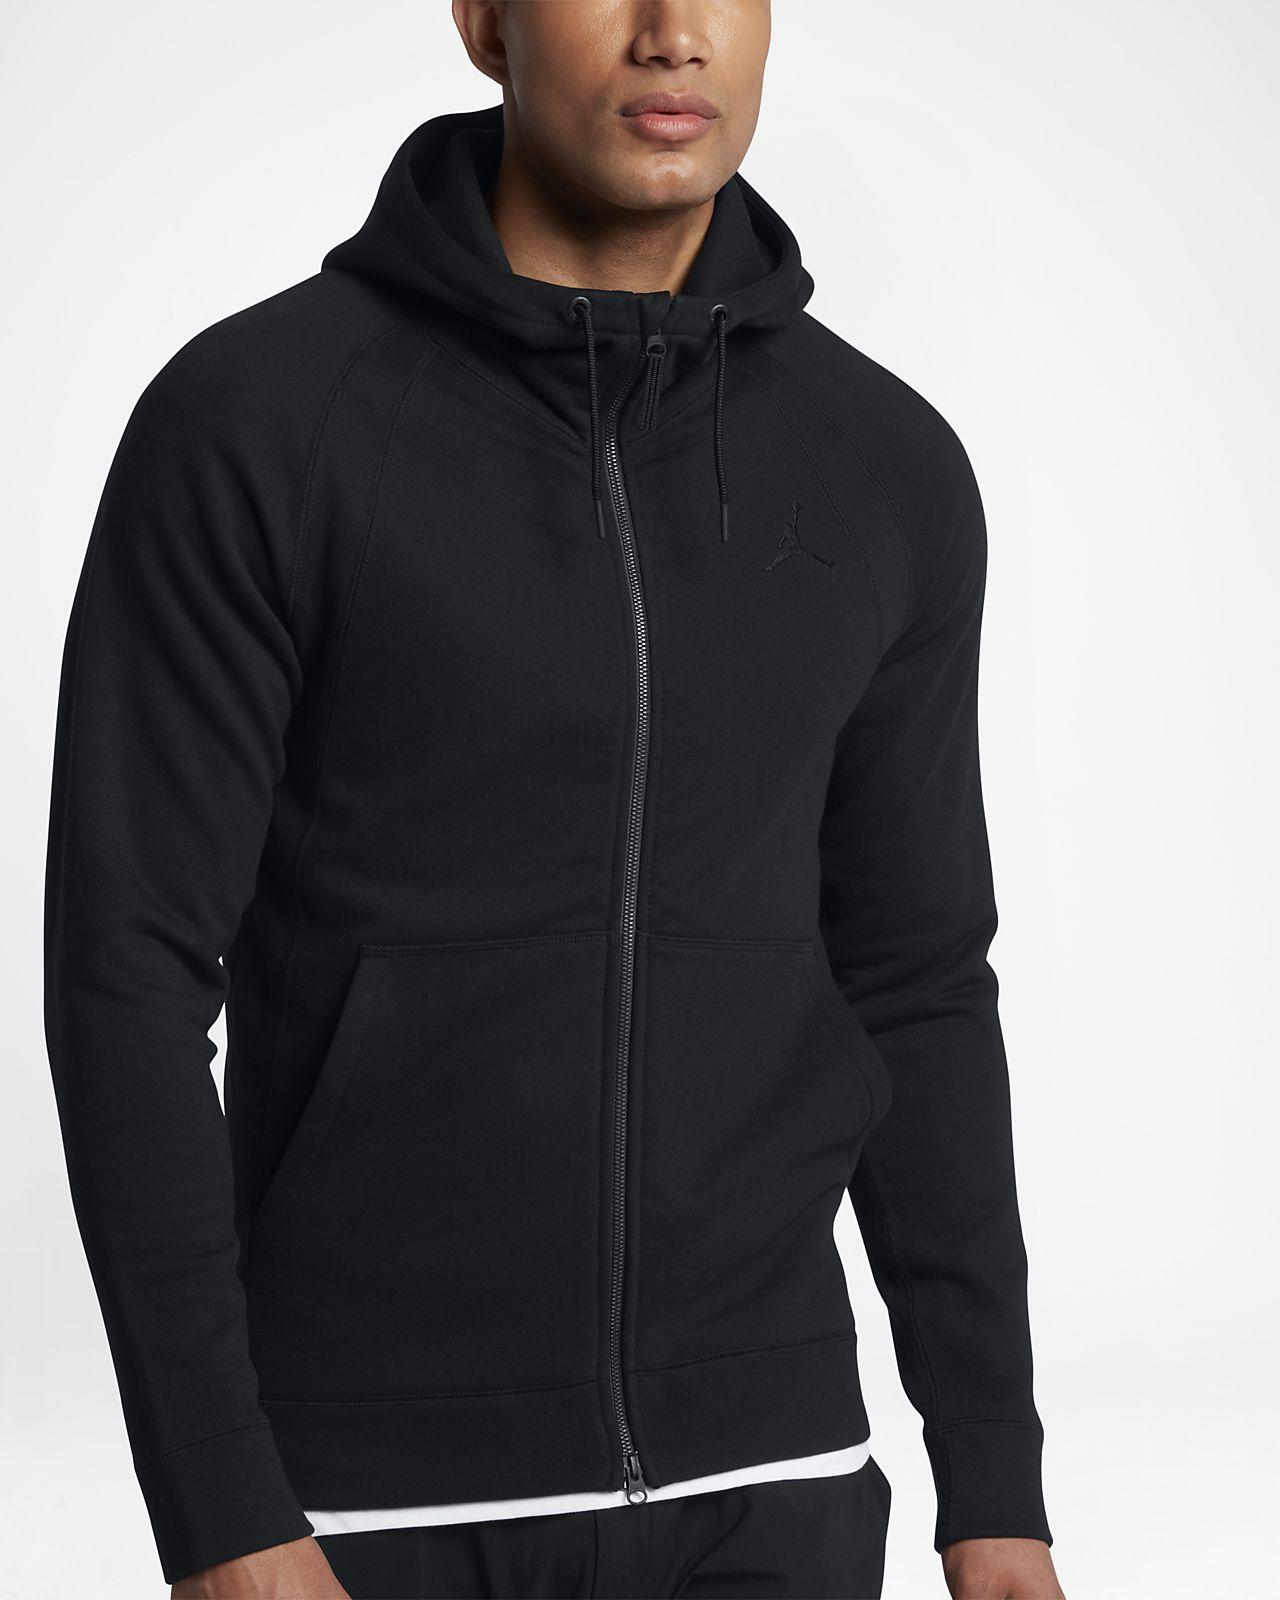 6a758ccc0 Jordan Lifestyle Wings Fleece Men s Full-Zip Hoodie. Nike.com NO